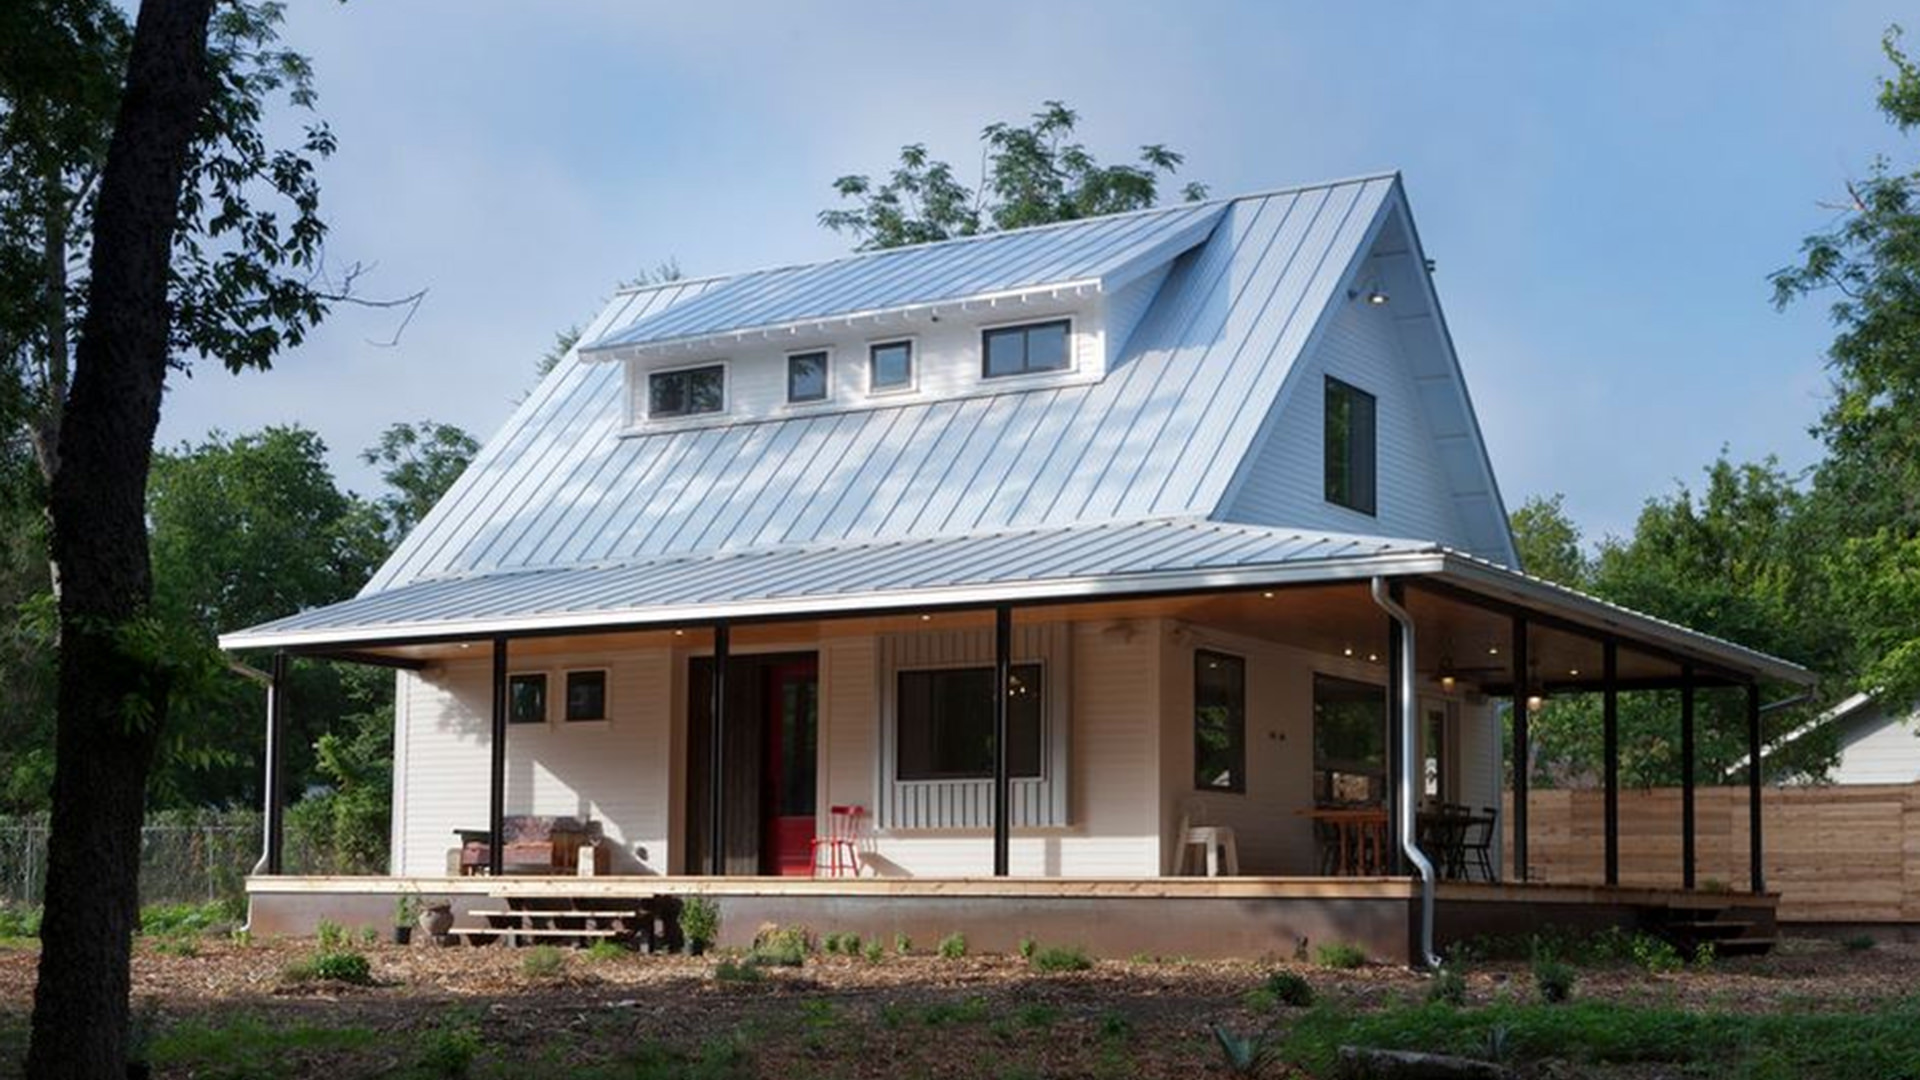 Galvalume plus standing seam metal roof